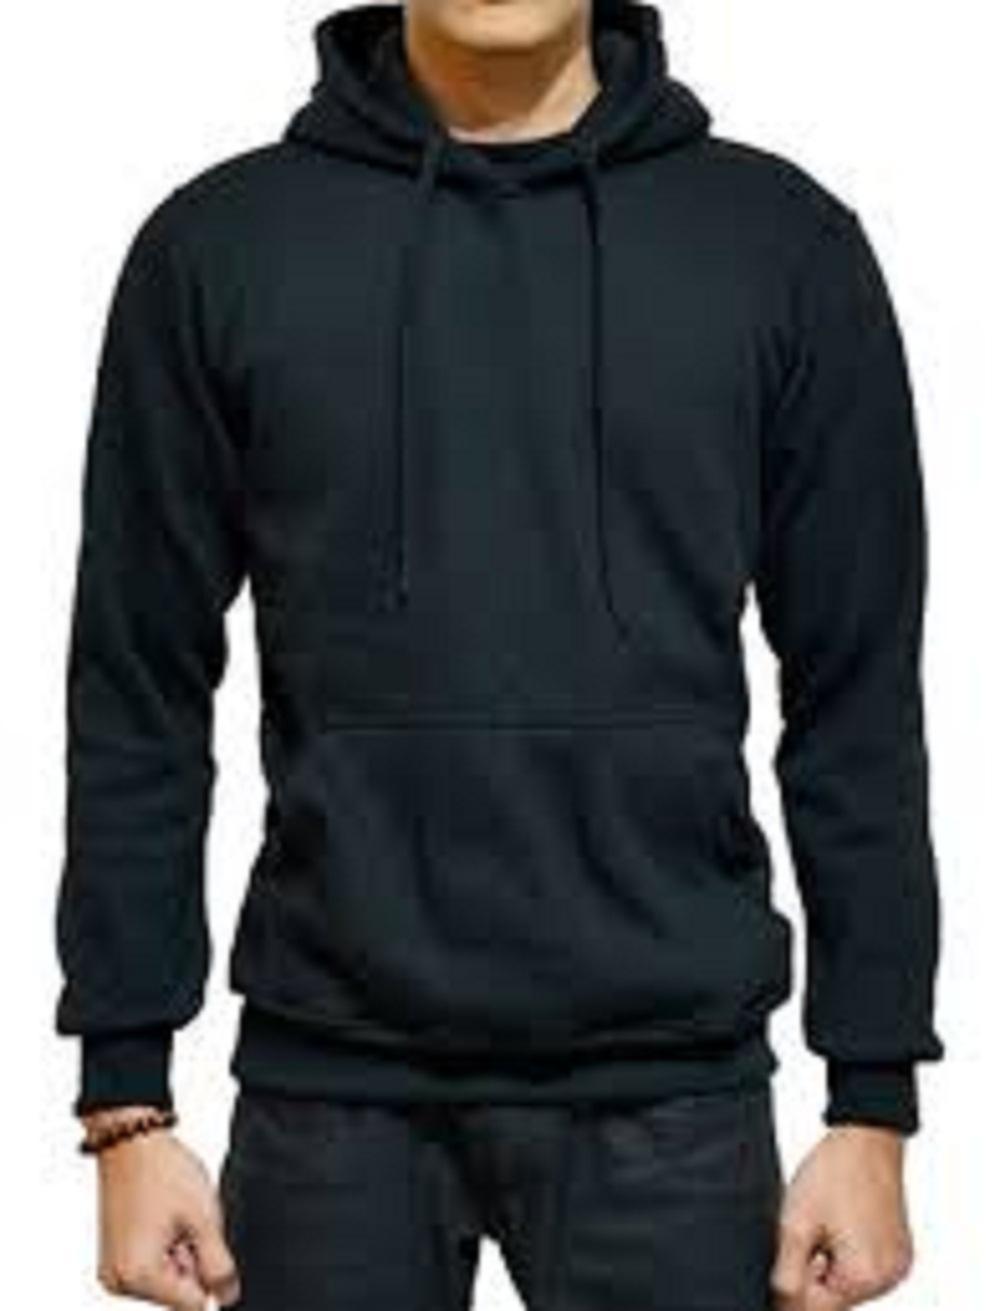 Jaket Hoodie Pria Terbaru Terlengkap Sweater Polos Zipper Biru Dongker Navy Az99 Sweter Korea